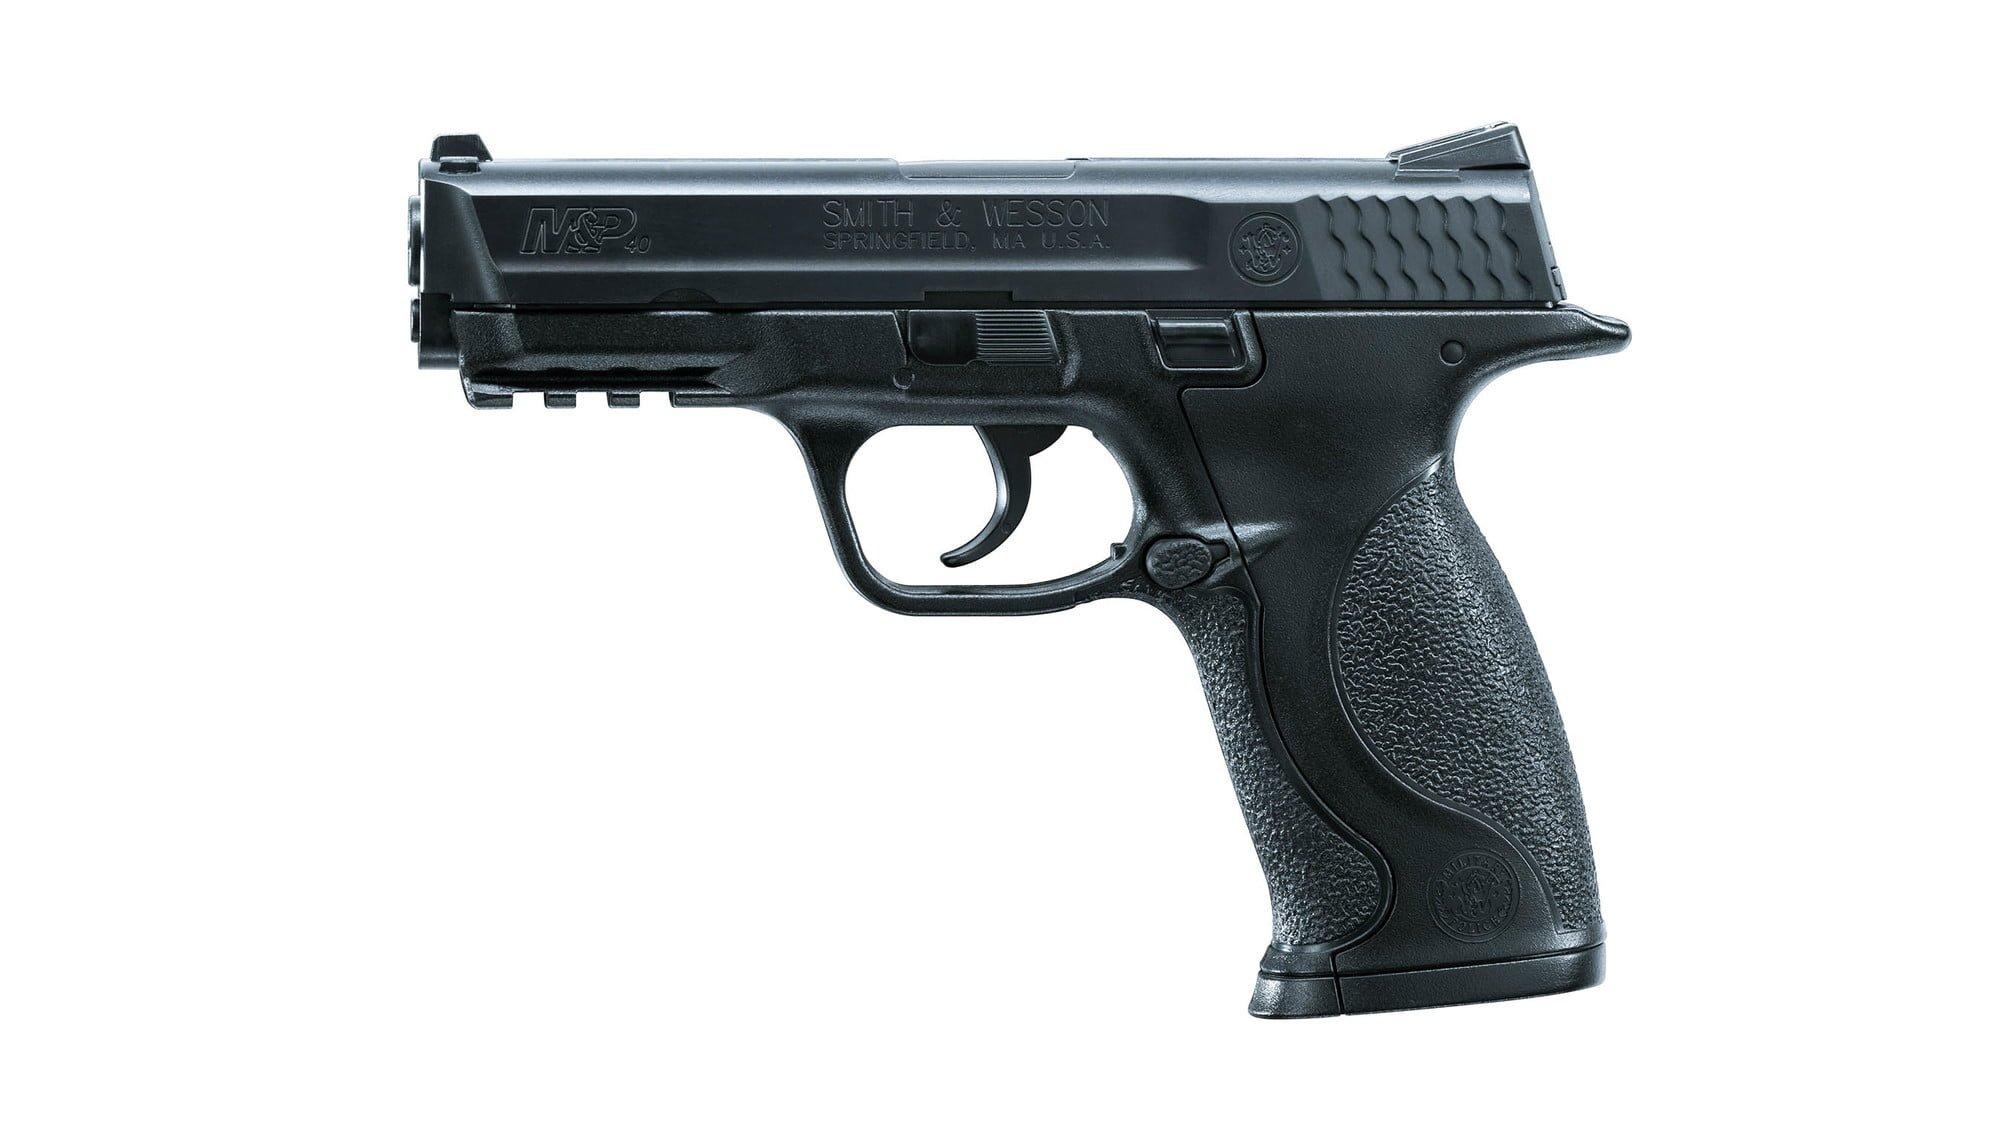 d90e01f515 Pistola CO2 4,5mm Smith & Wesson M&P40 UMAREX - ElBunkker